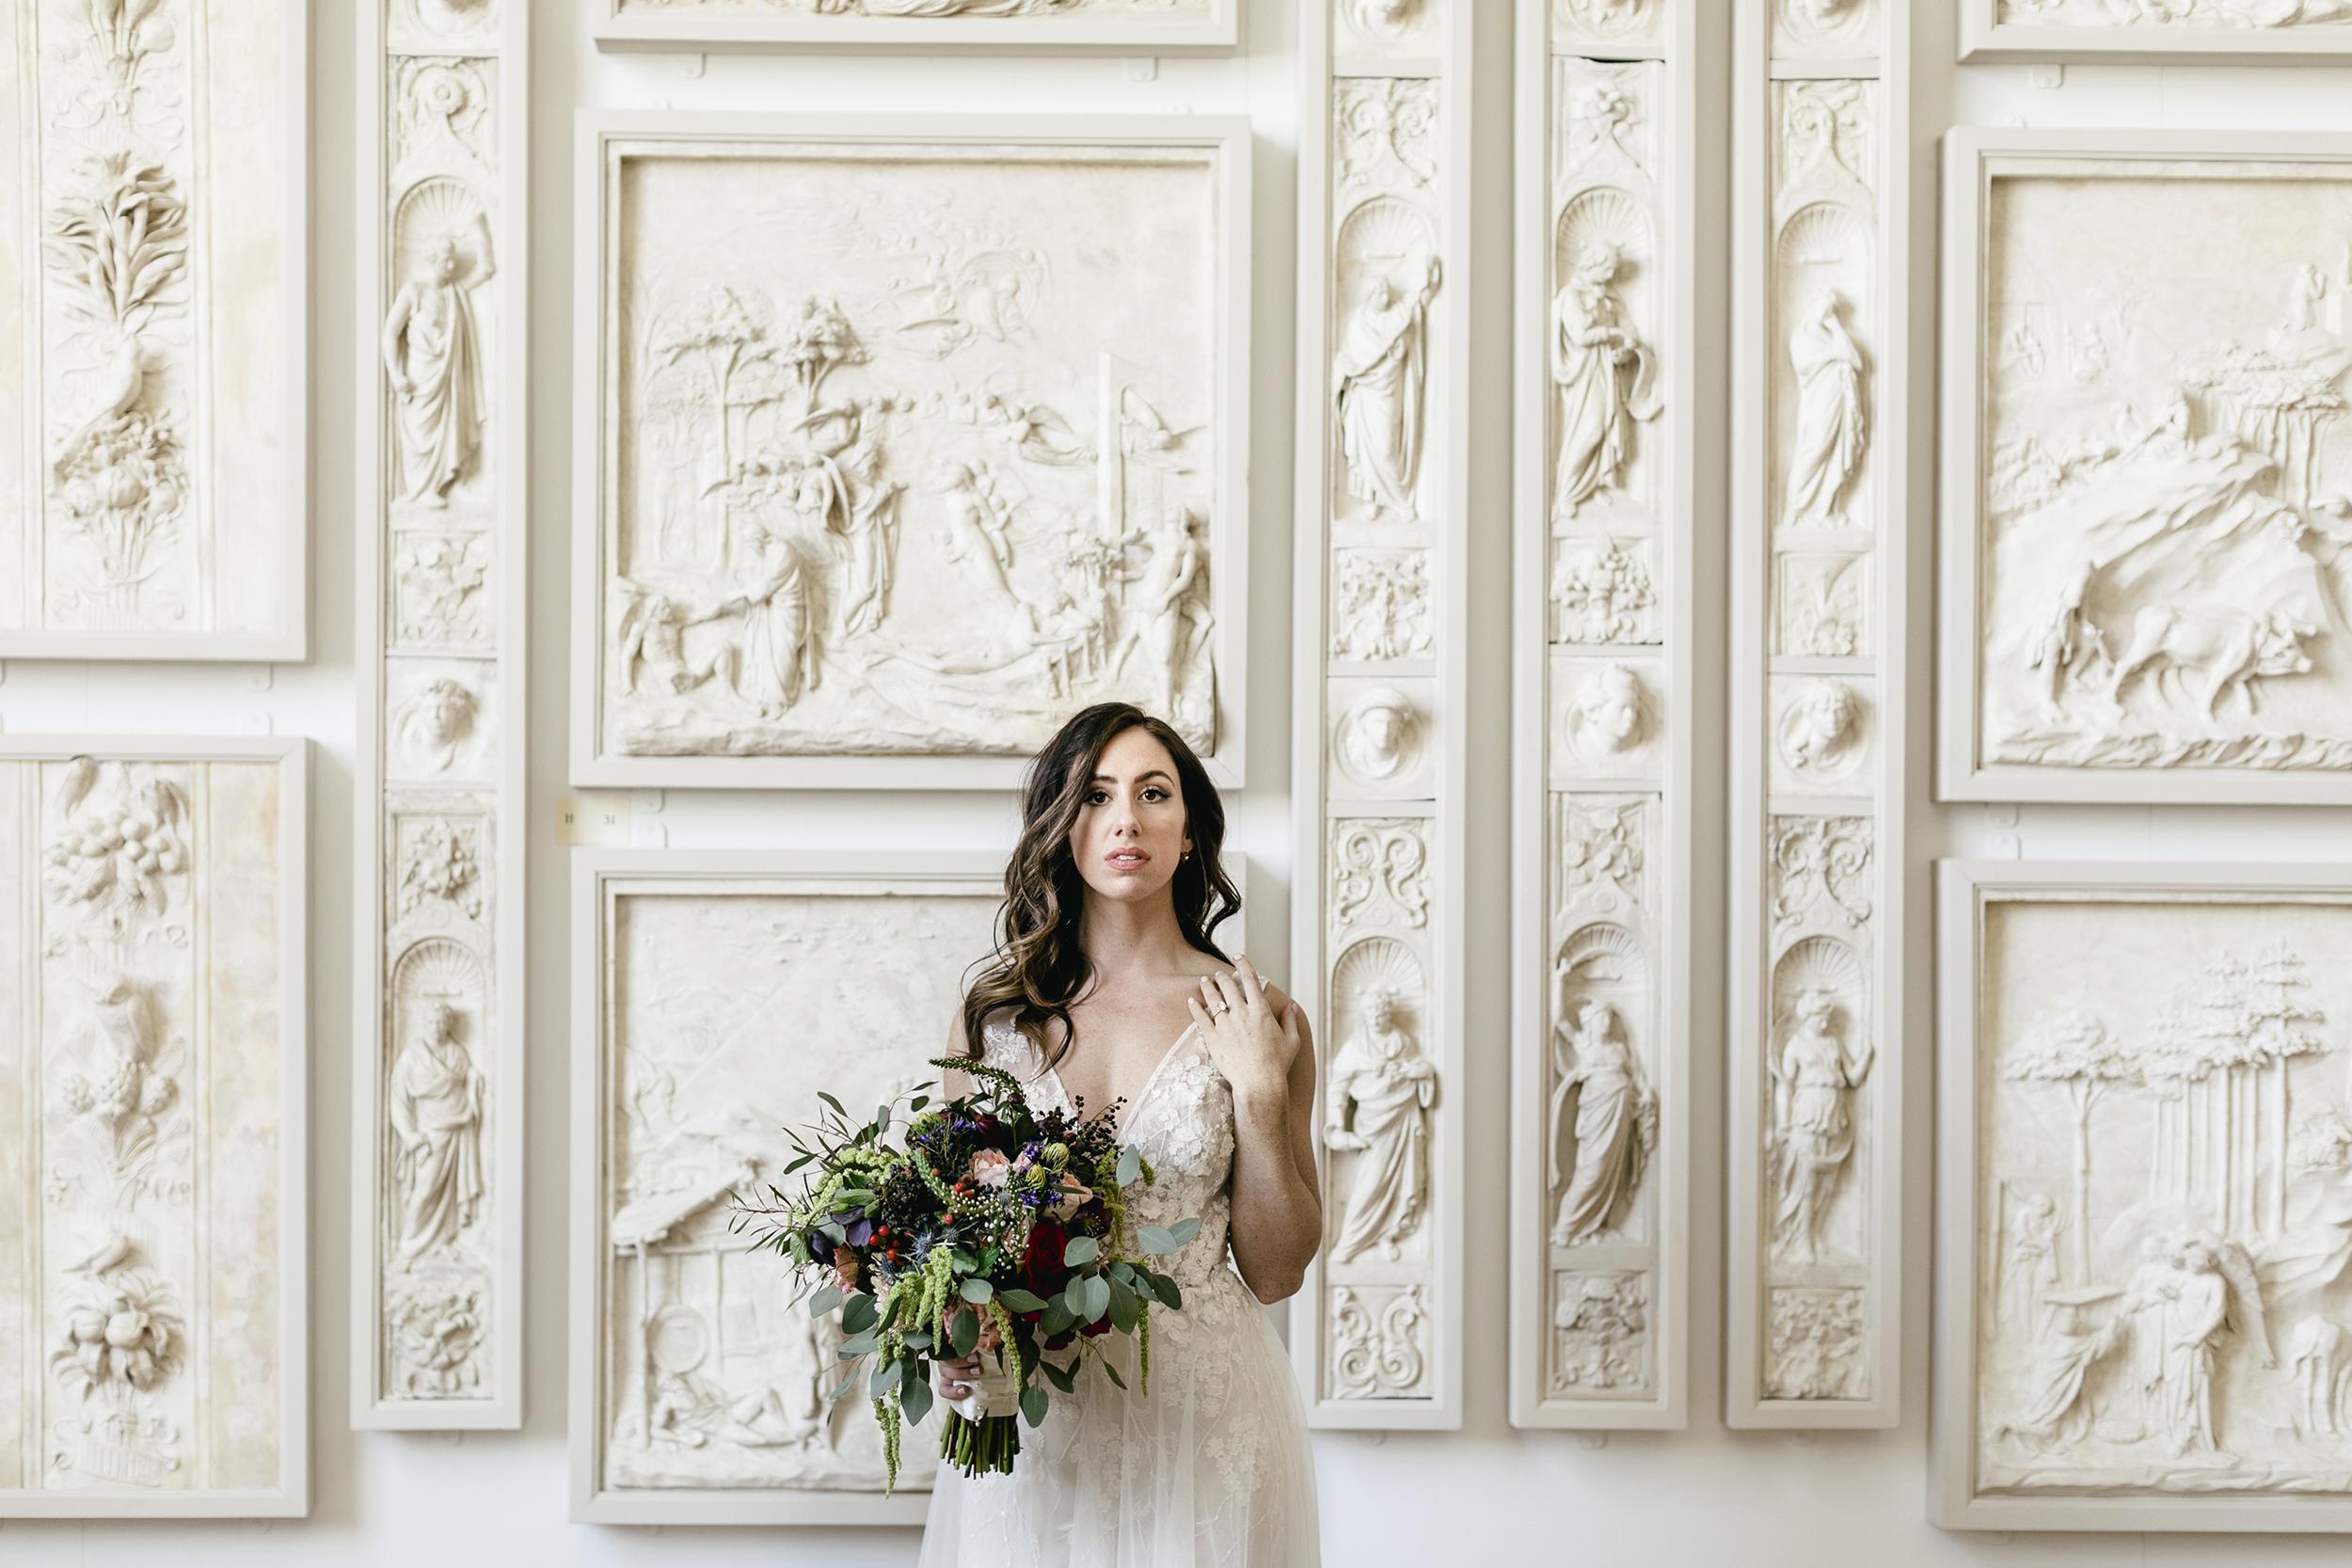 photography-wedding-weddings-natural-candid-pafa-pennsylvania academy-philadephia-philly-philadelphia wedding-mixed race-editorial-modern-fine-art-043.JPG